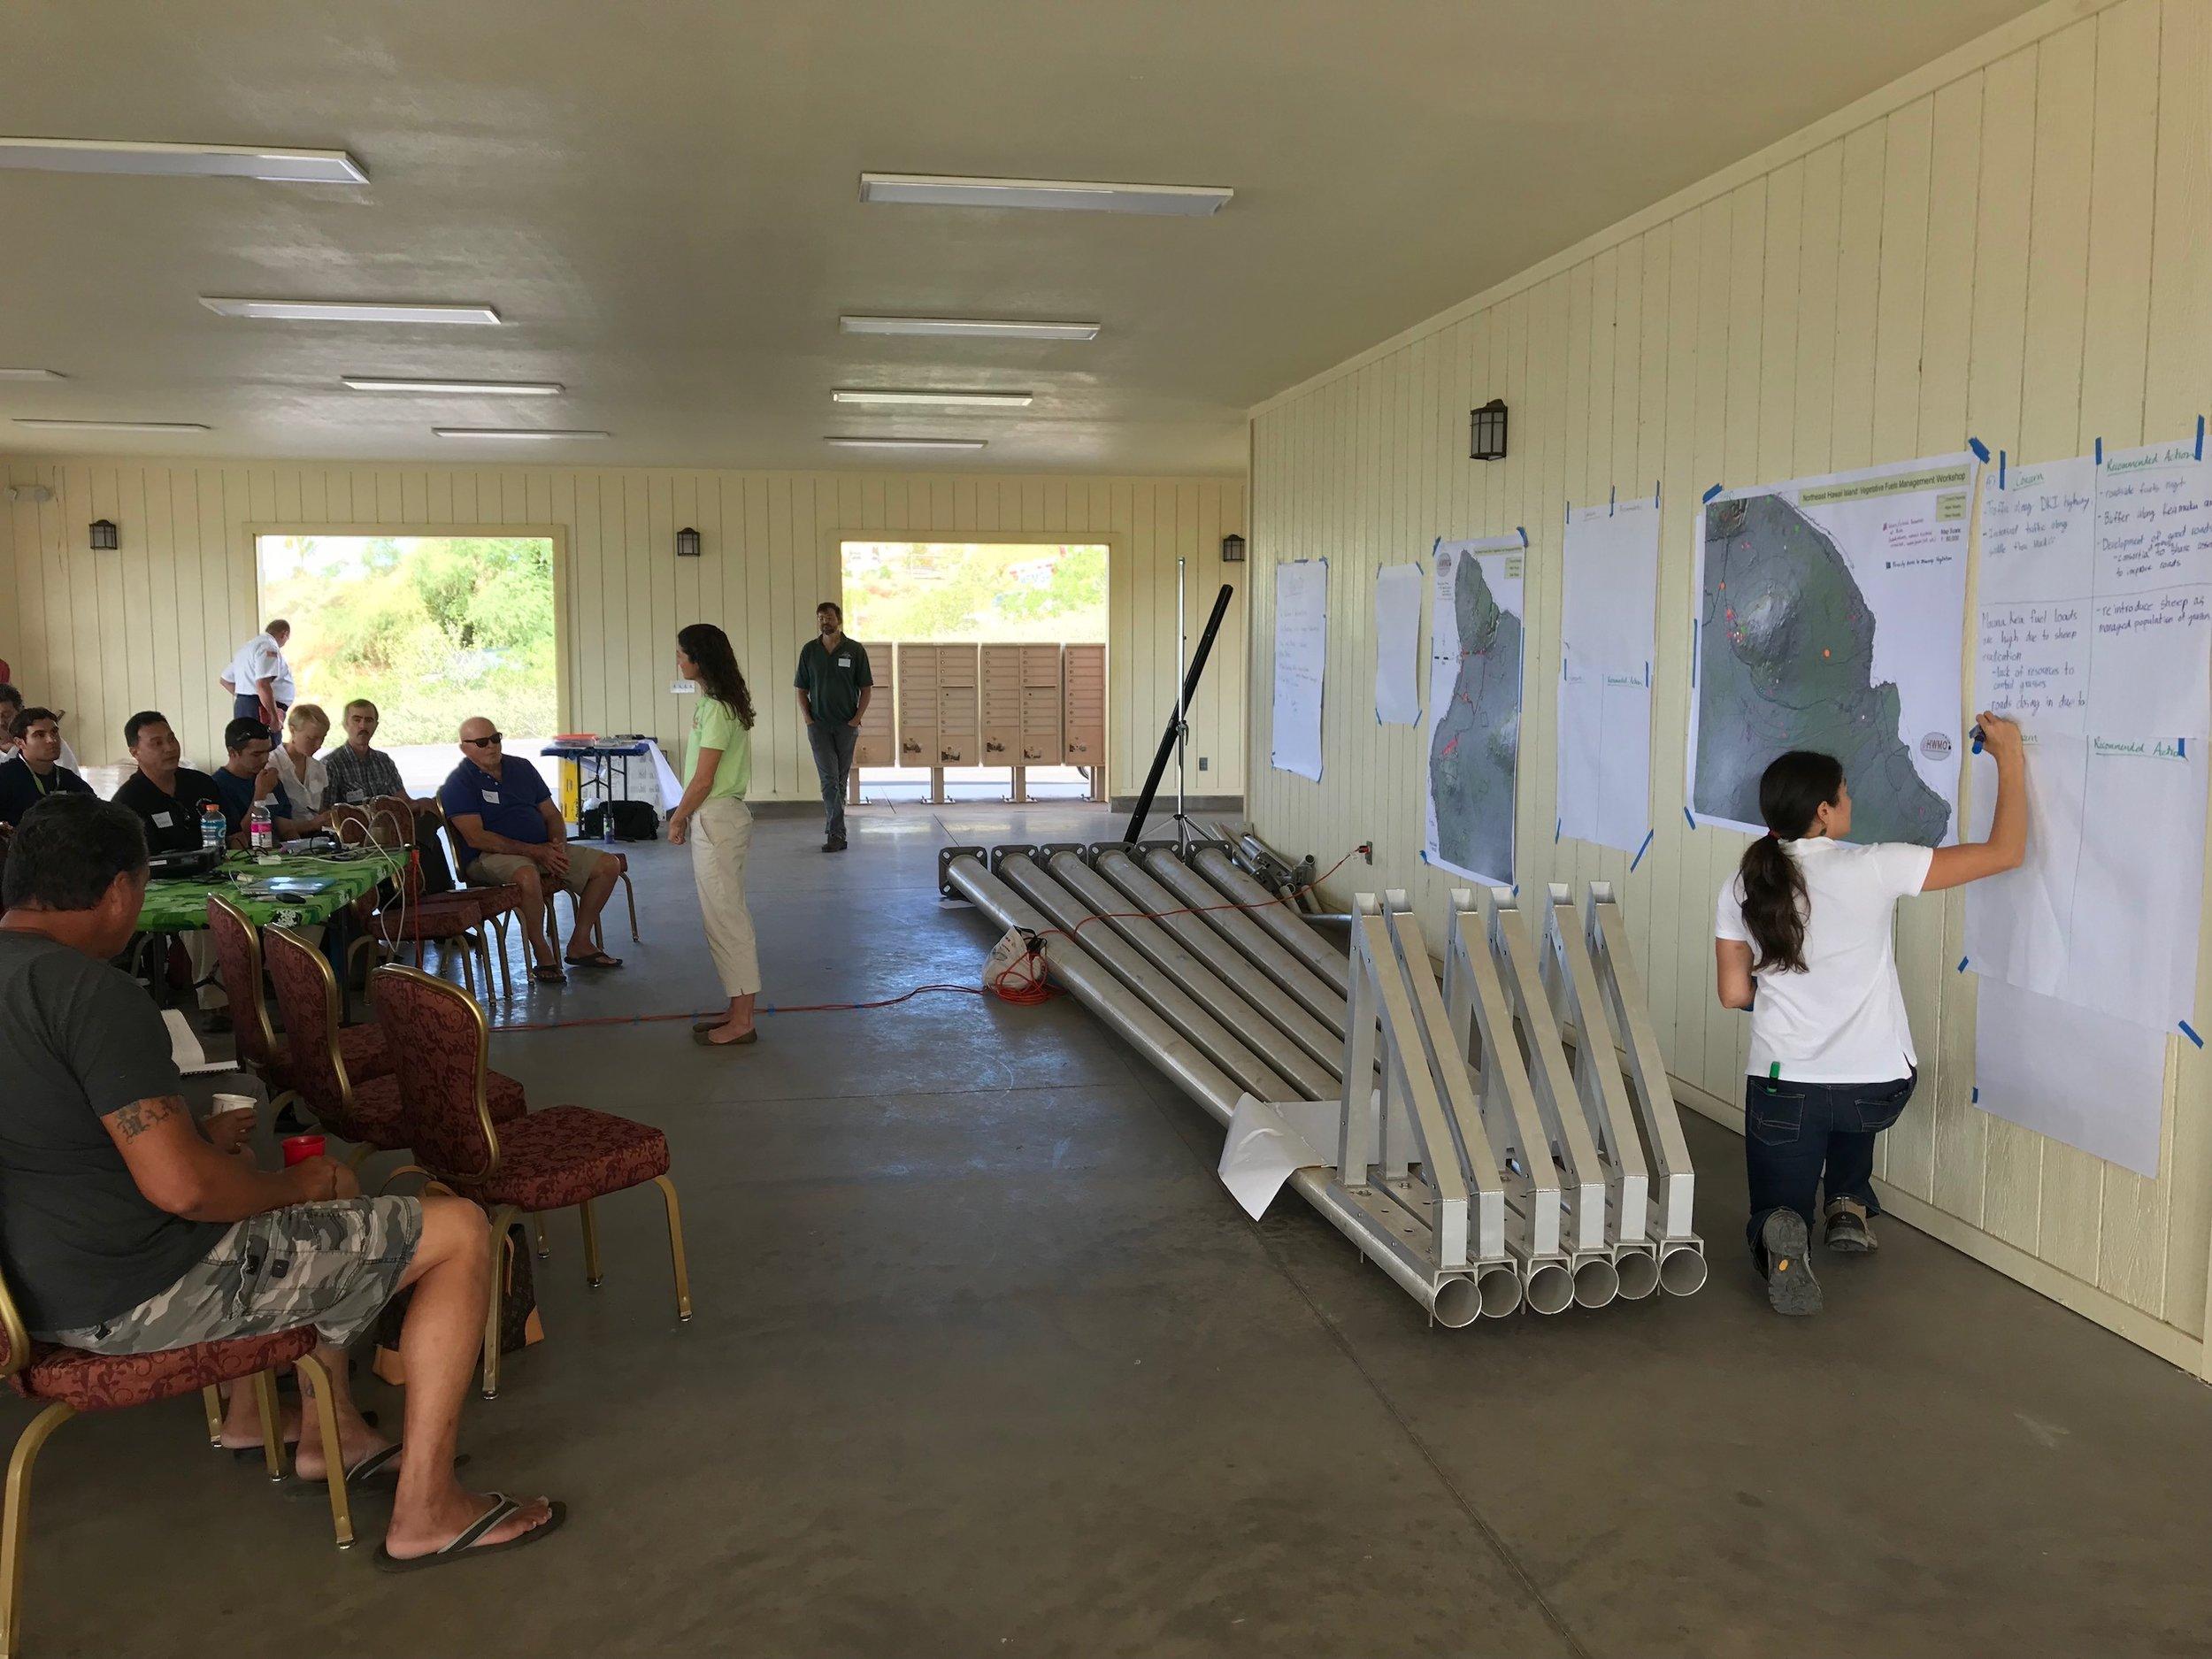 Hawaii Island Kailapa Vegetative Fuels Management Collaborative Action Planning Workshop_2_26_2019_63.jpg